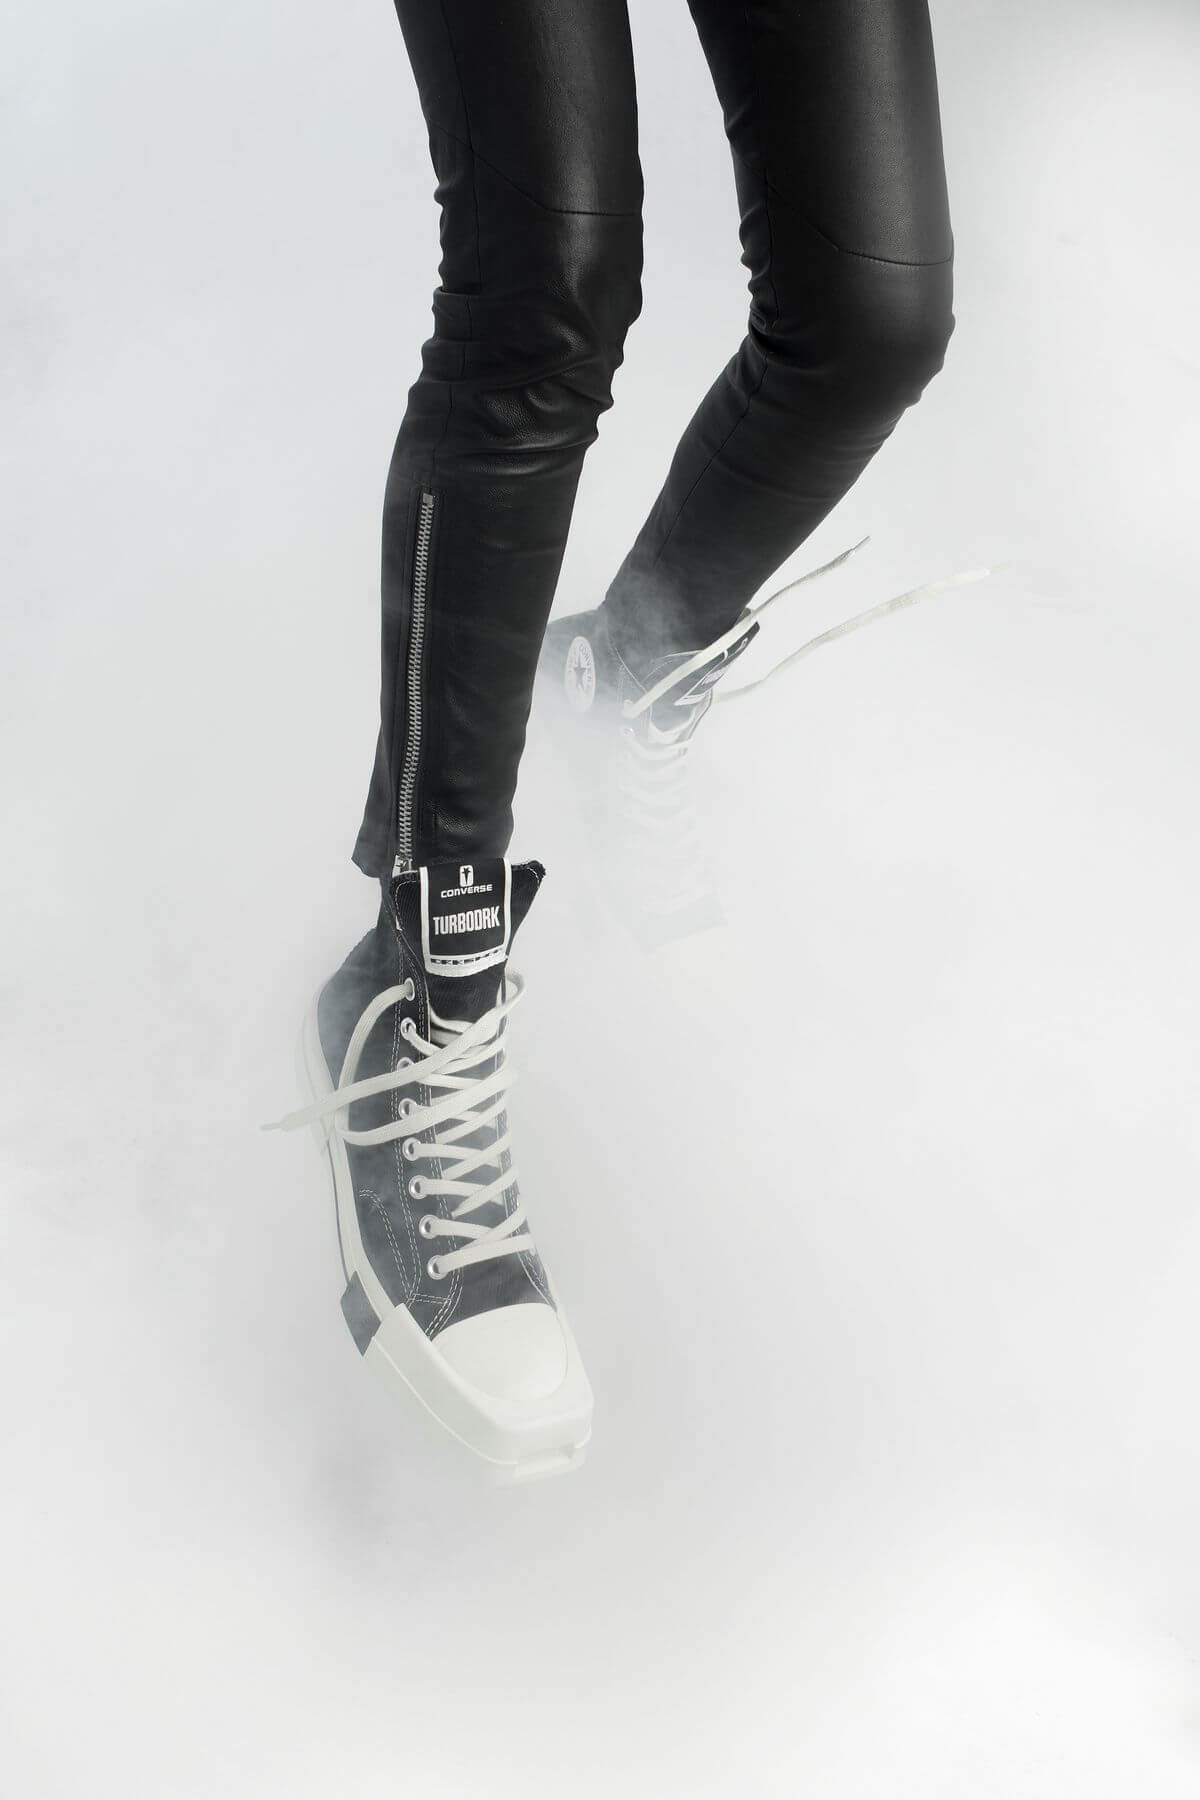 Converse x Rick Owens - DRKSHDW - TurboDark Chuck 70 Low white and High black